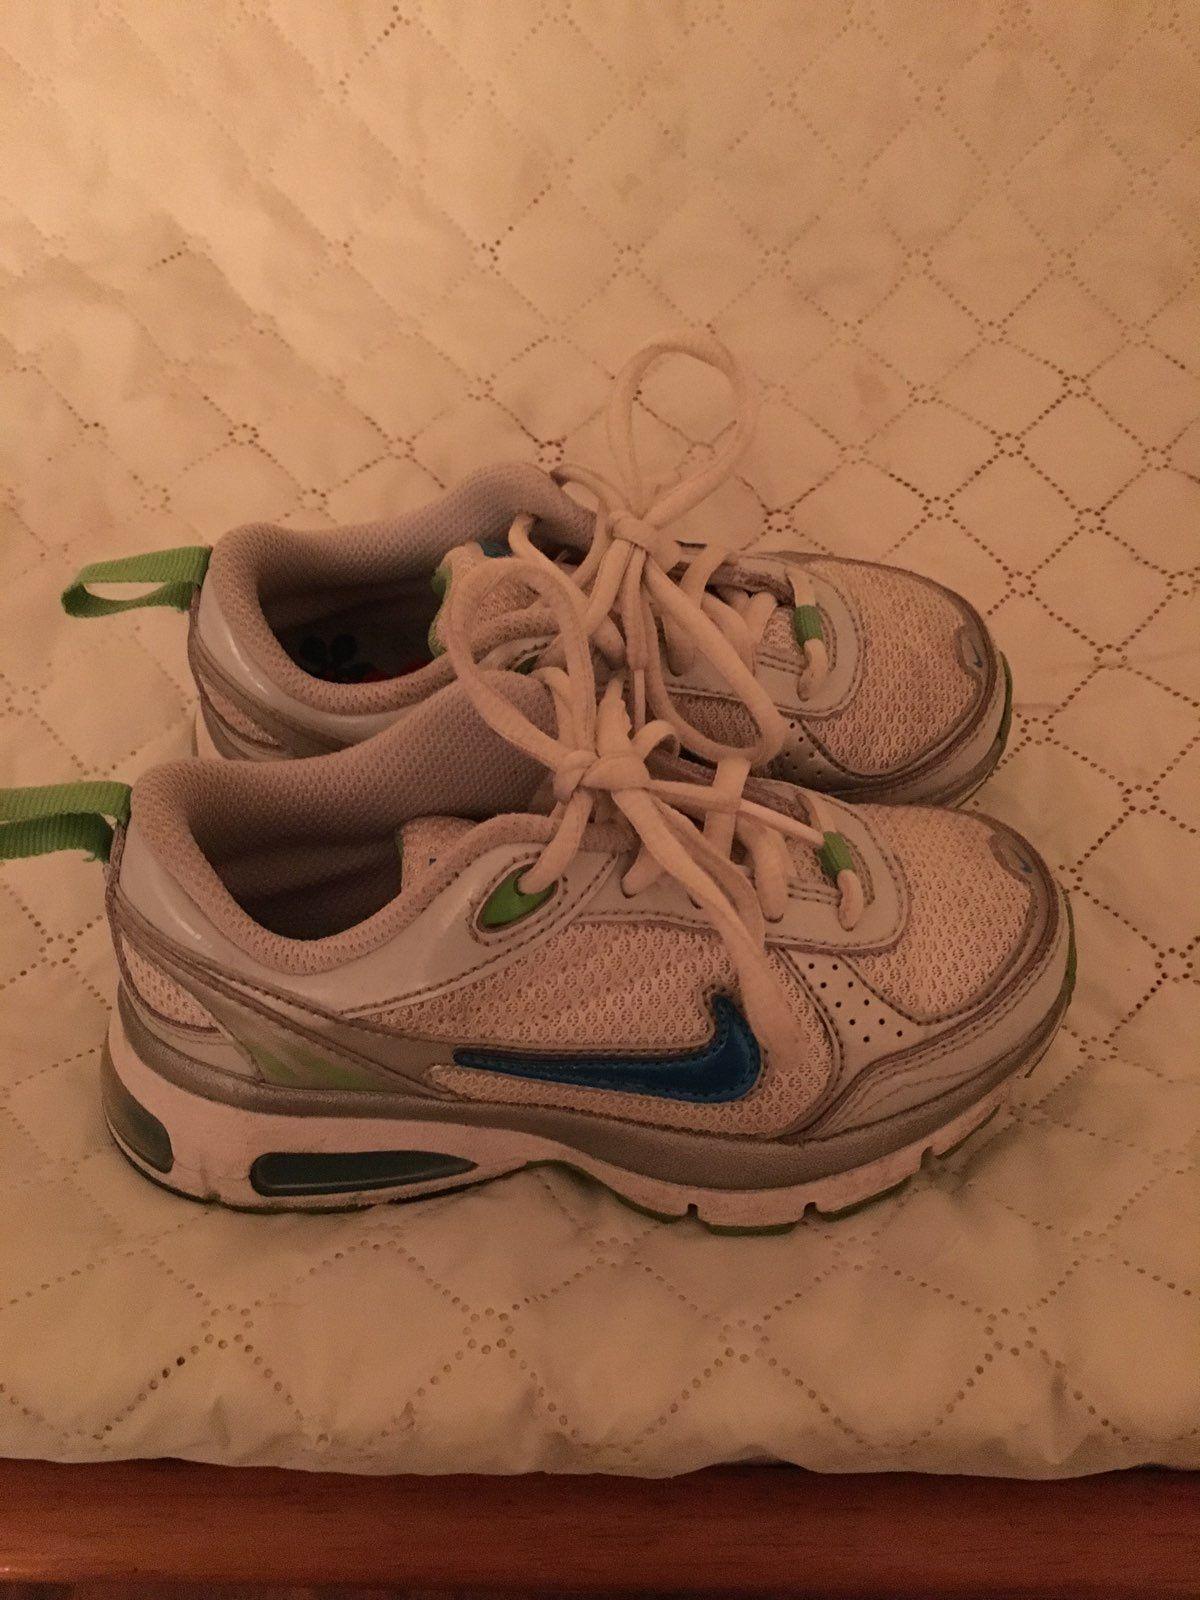 Nike Tennis Shoes For Toddler Girl Style Guru Fashion